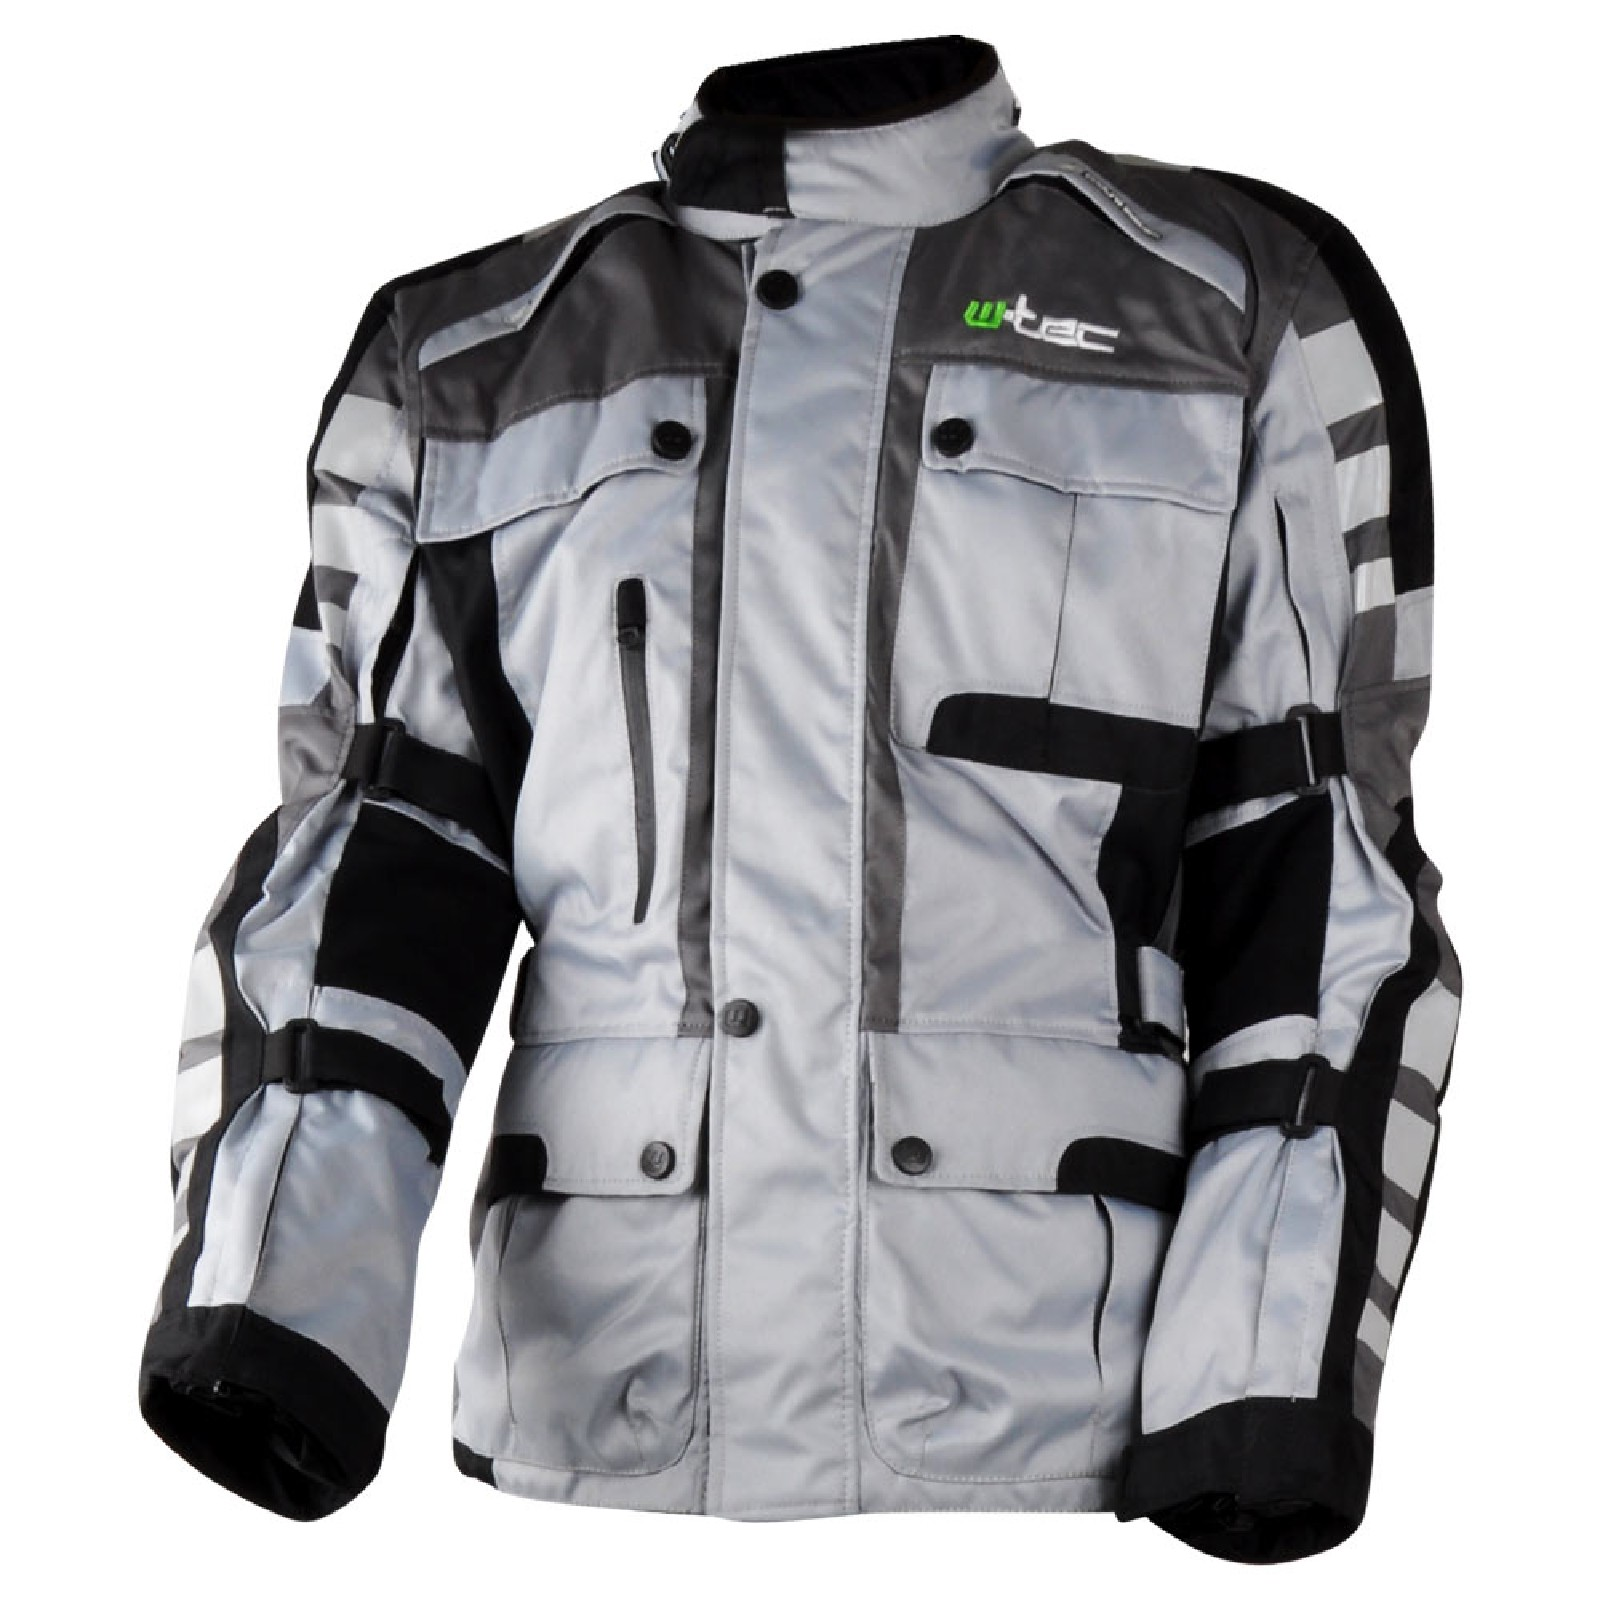 Moto bunda w-tec - Bolder.cz - Oblečeme každého! fe8f181f28